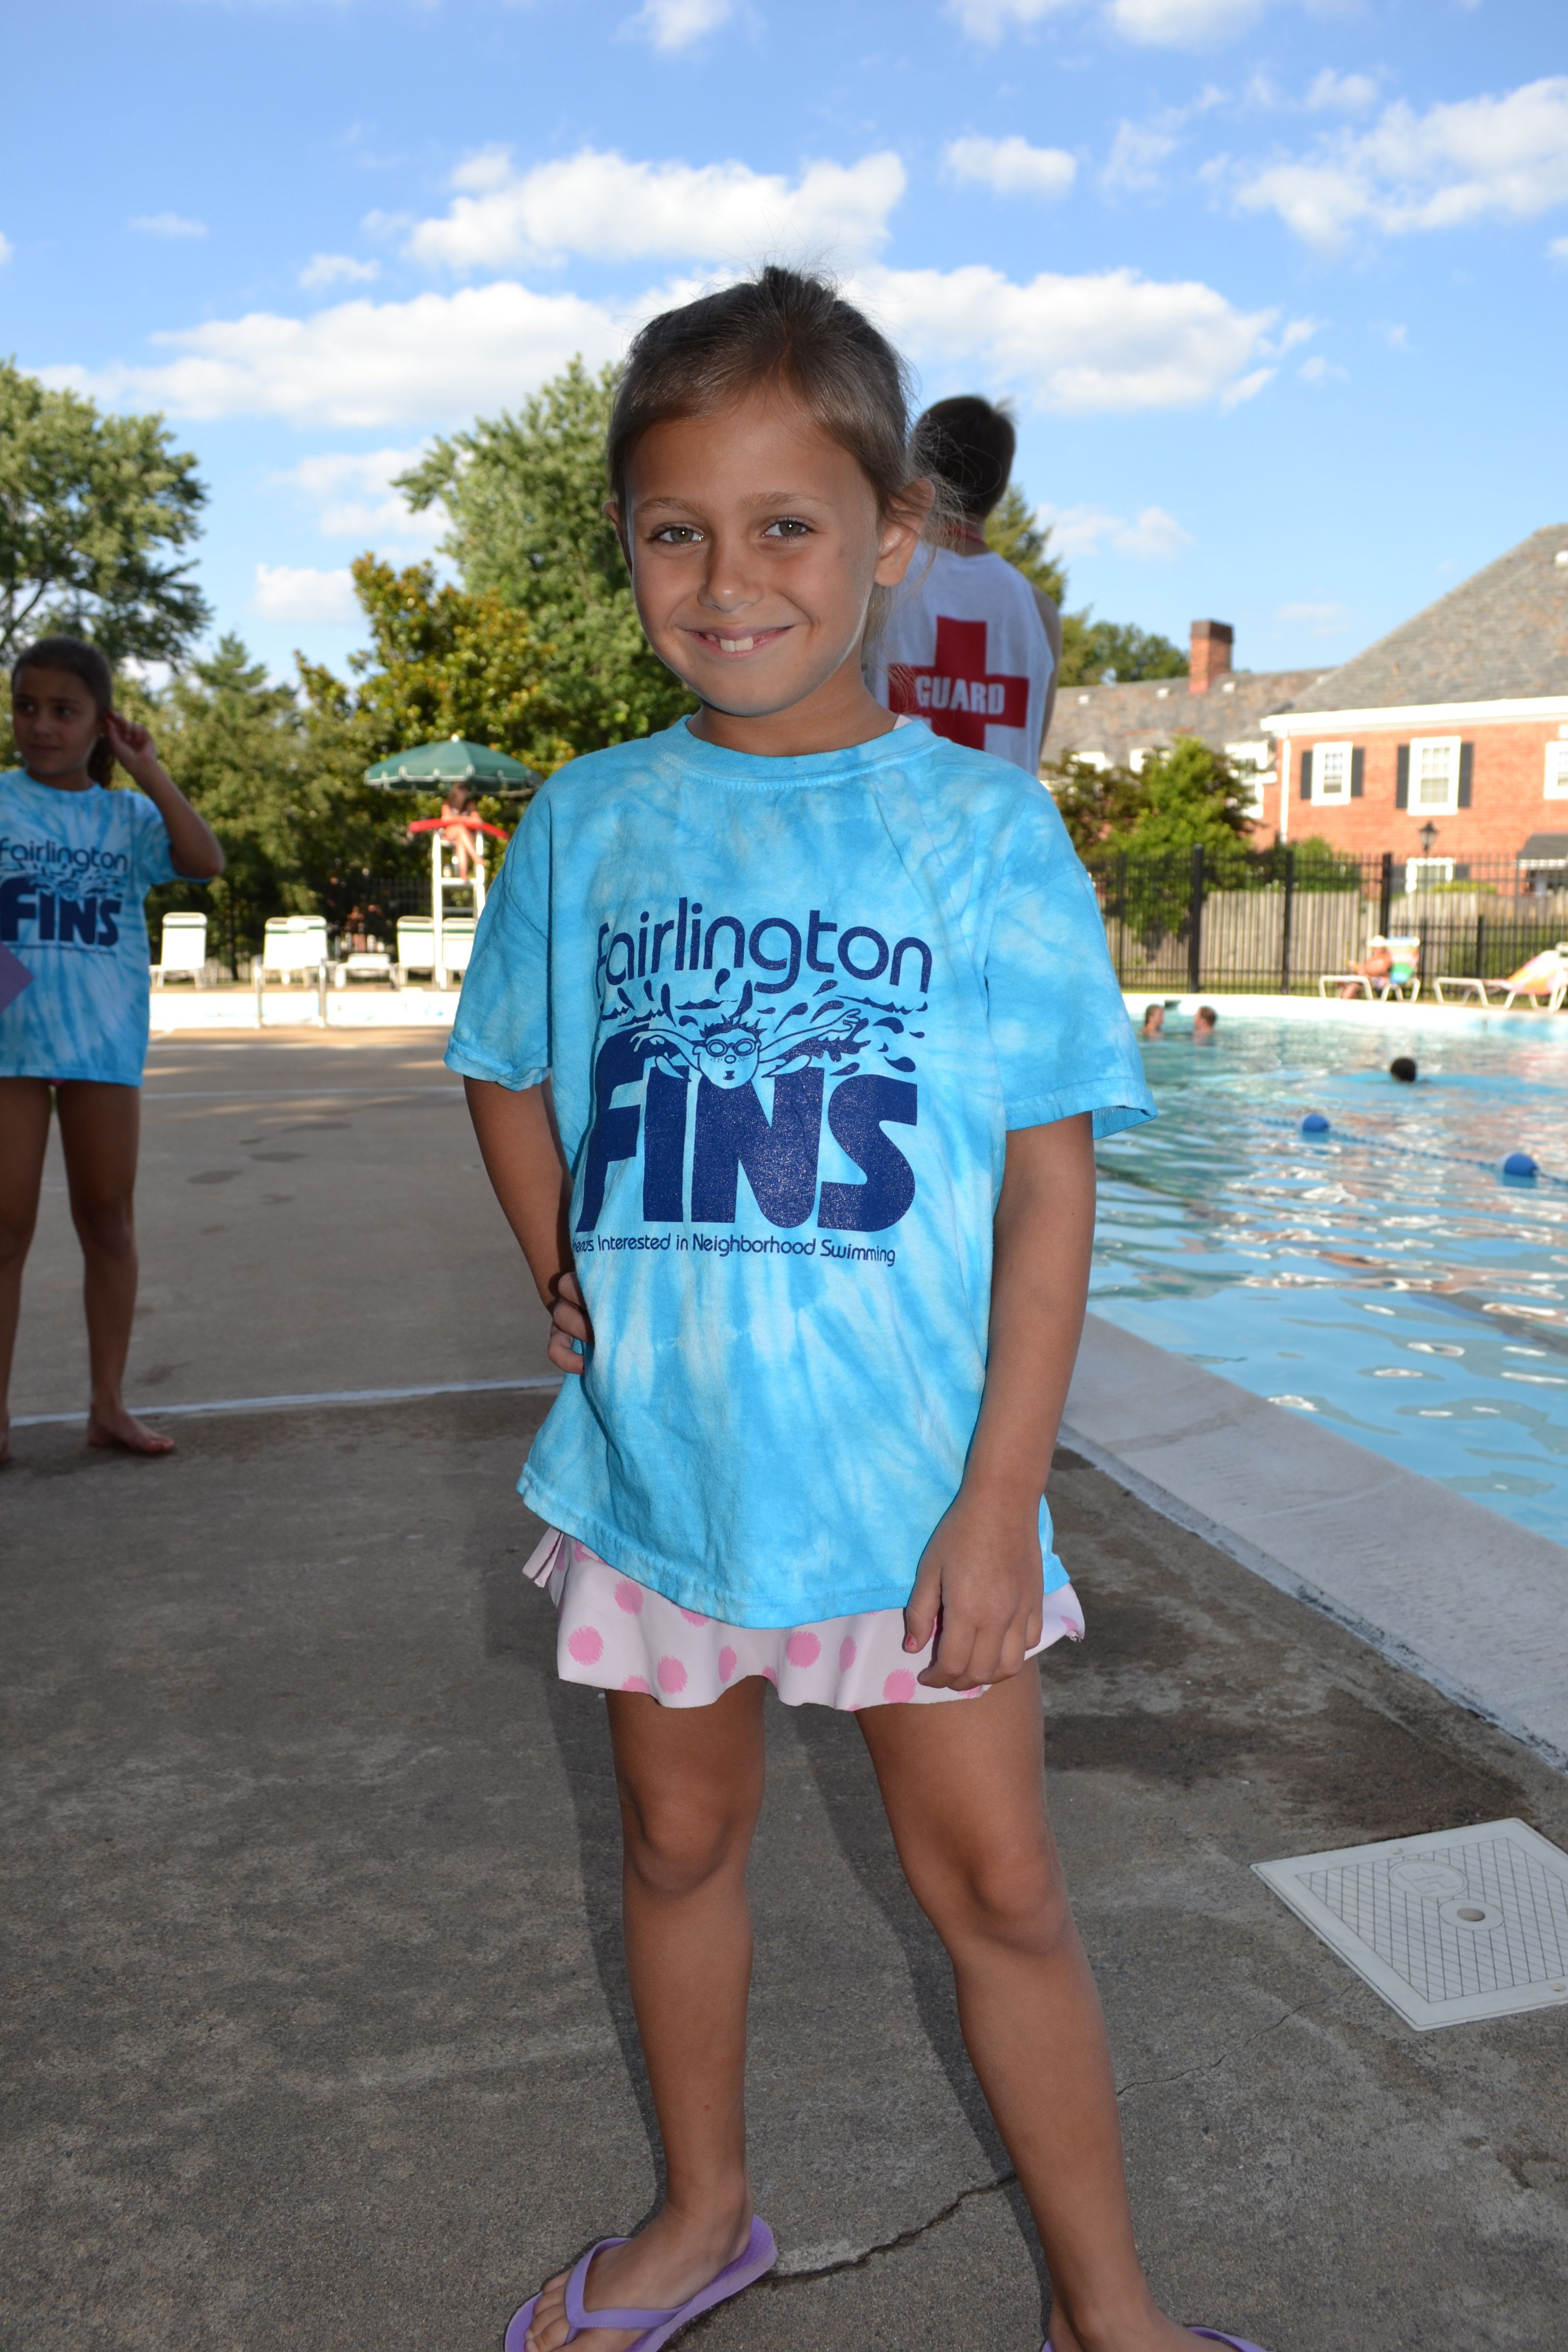 Fairlington FINS, a swim team t-shirt design. | VSGD | Pinterest